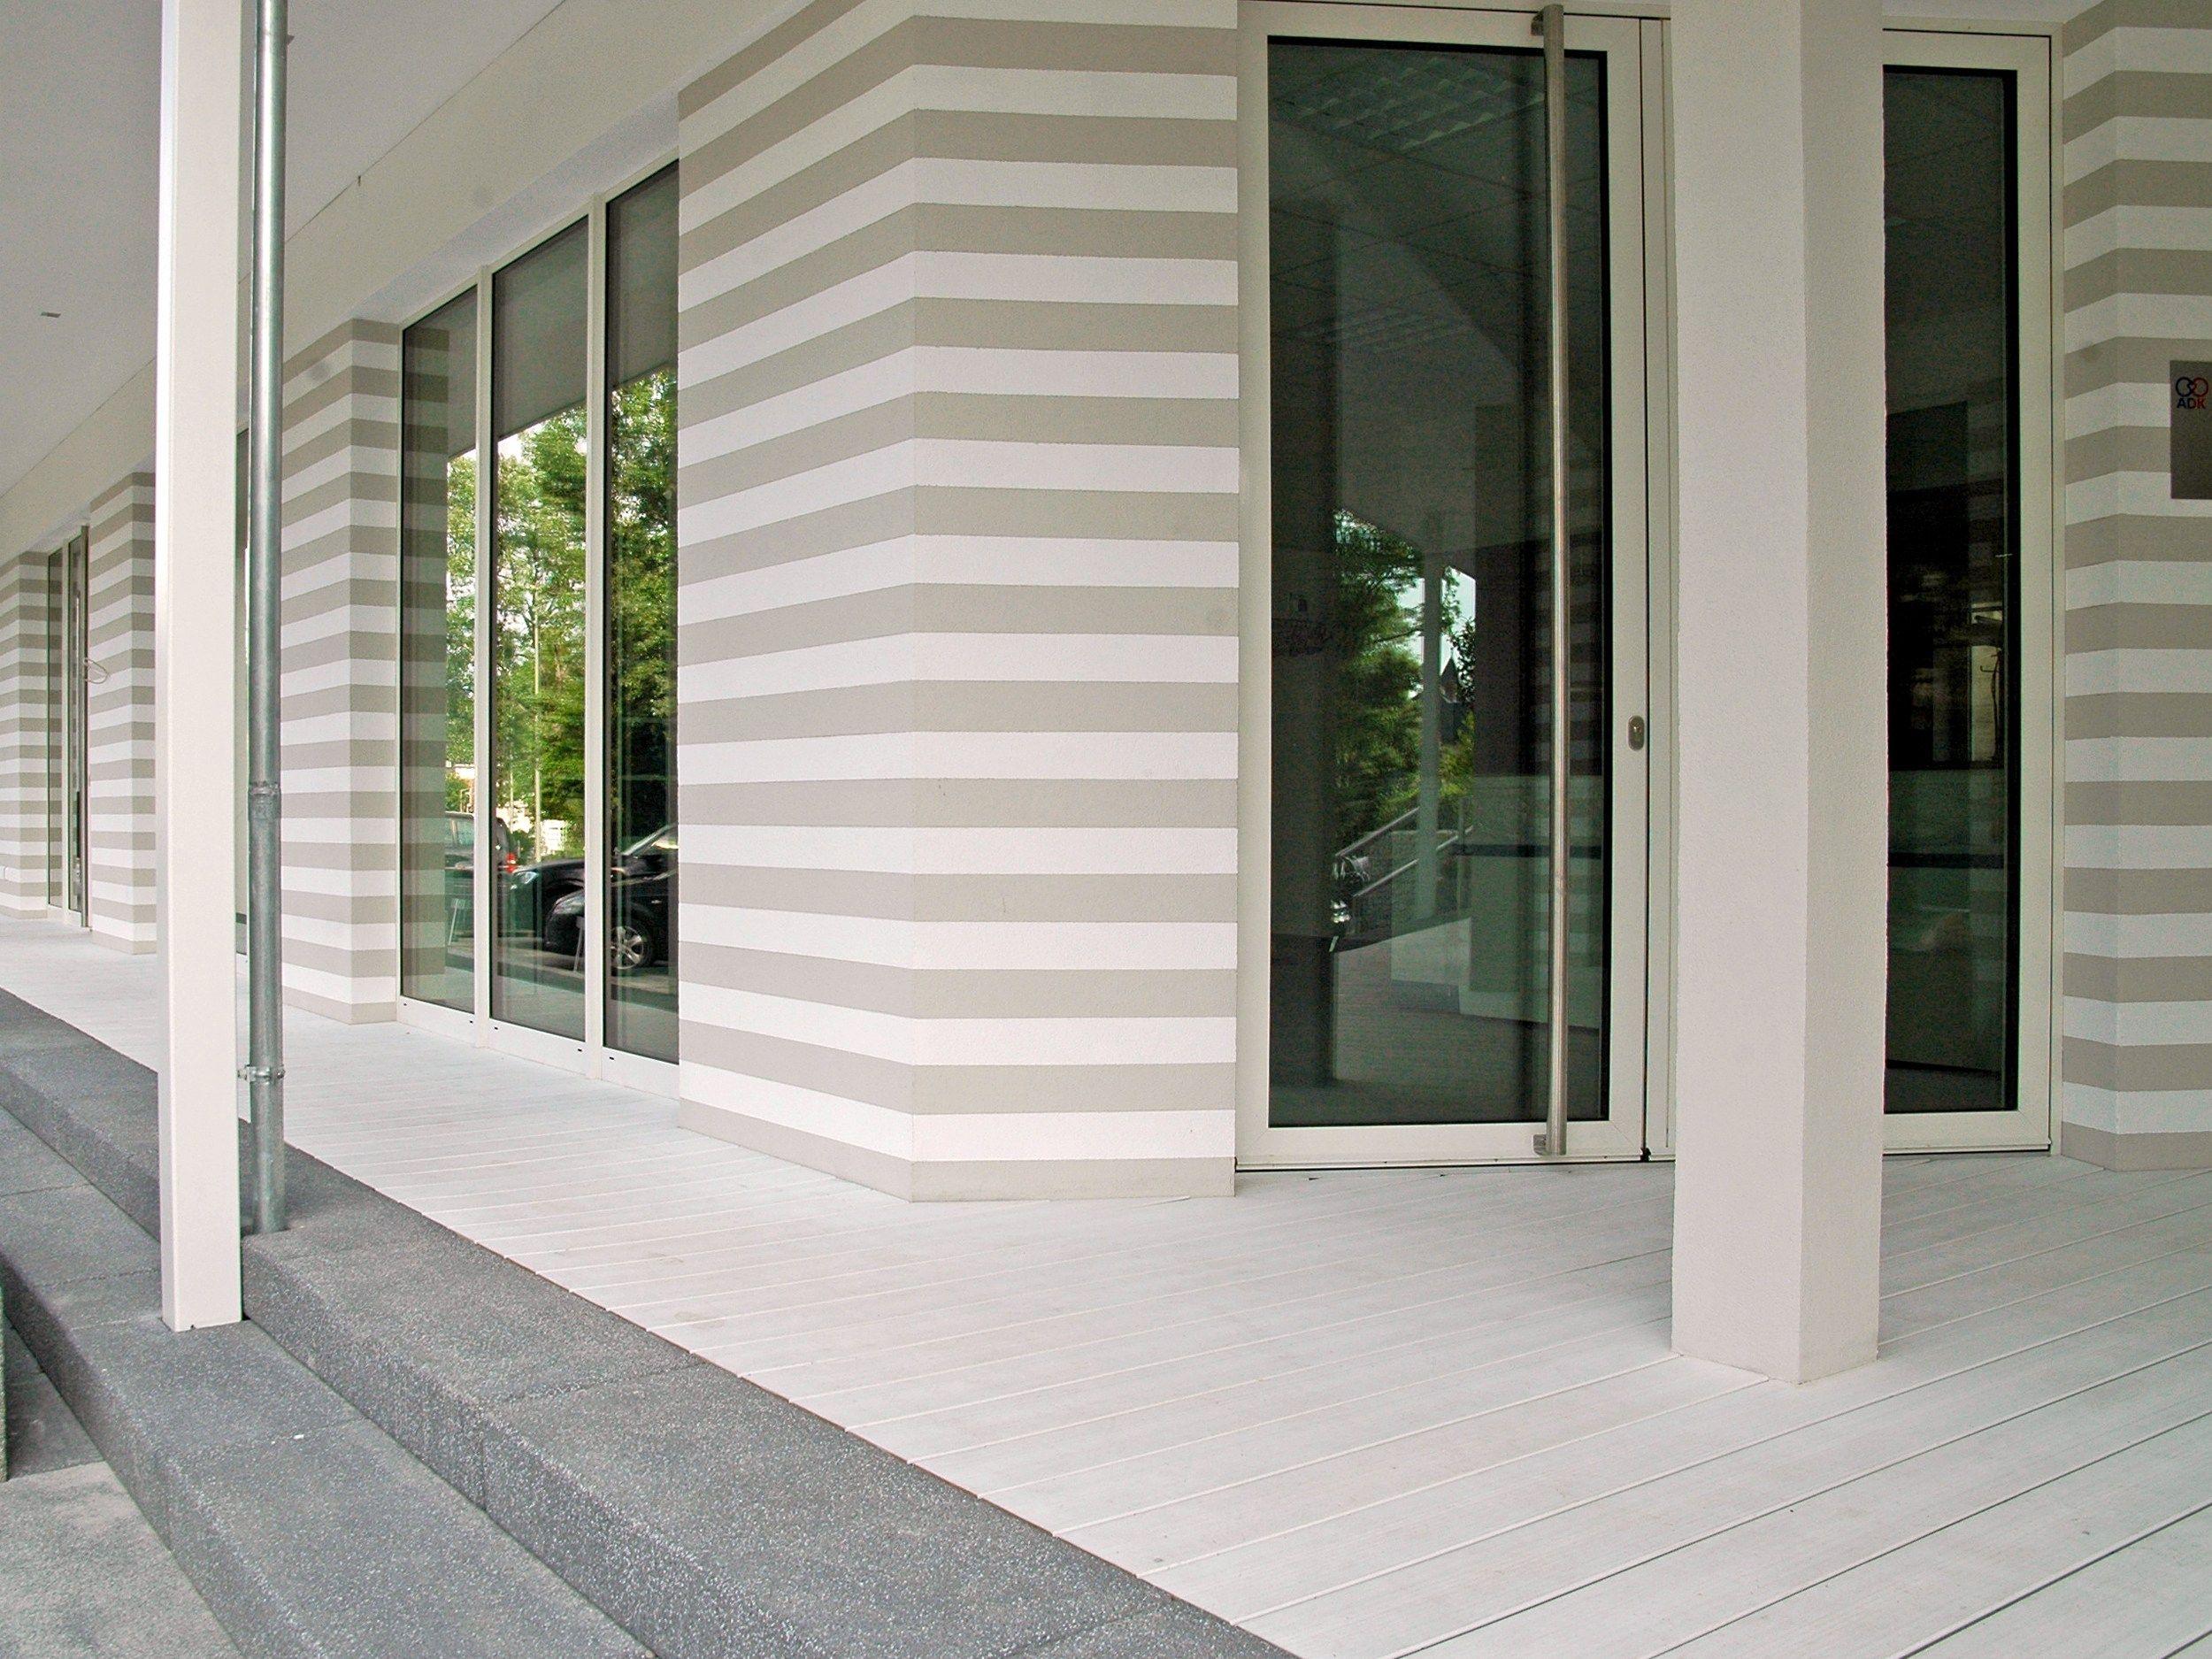 wpc decking paint by mydeck. Black Bedroom Furniture Sets. Home Design Ideas